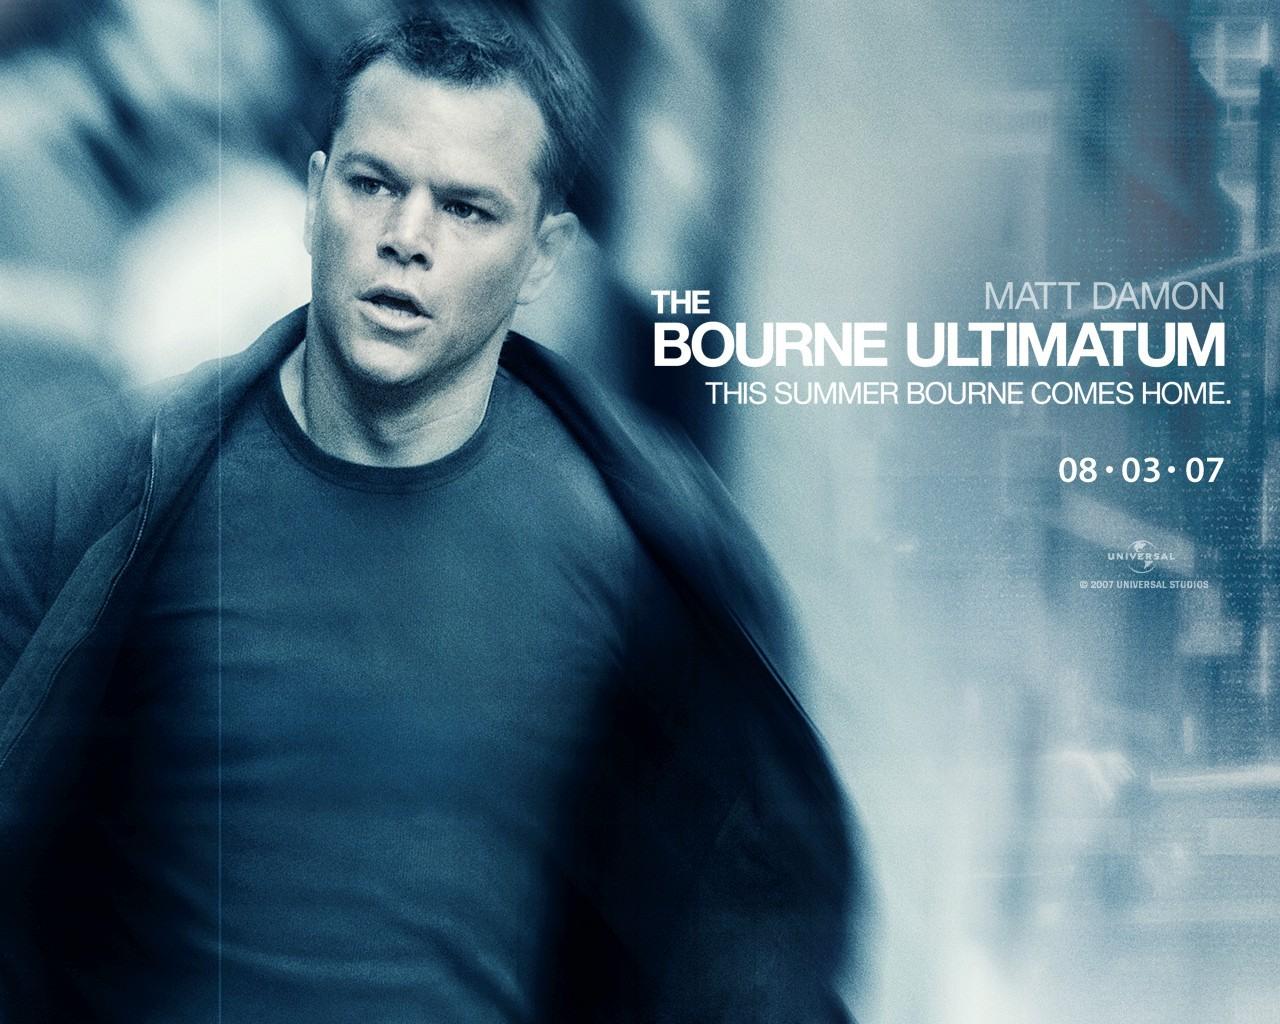 http://2.bp.blogspot.com/_LvebQJXzEiQ/S-5AtRQID8I/AAAAAAAAIPQ/g3Q9IbBPK3A/s1600/Bourne-Ultimatum-Matt-Damon-990.jpg